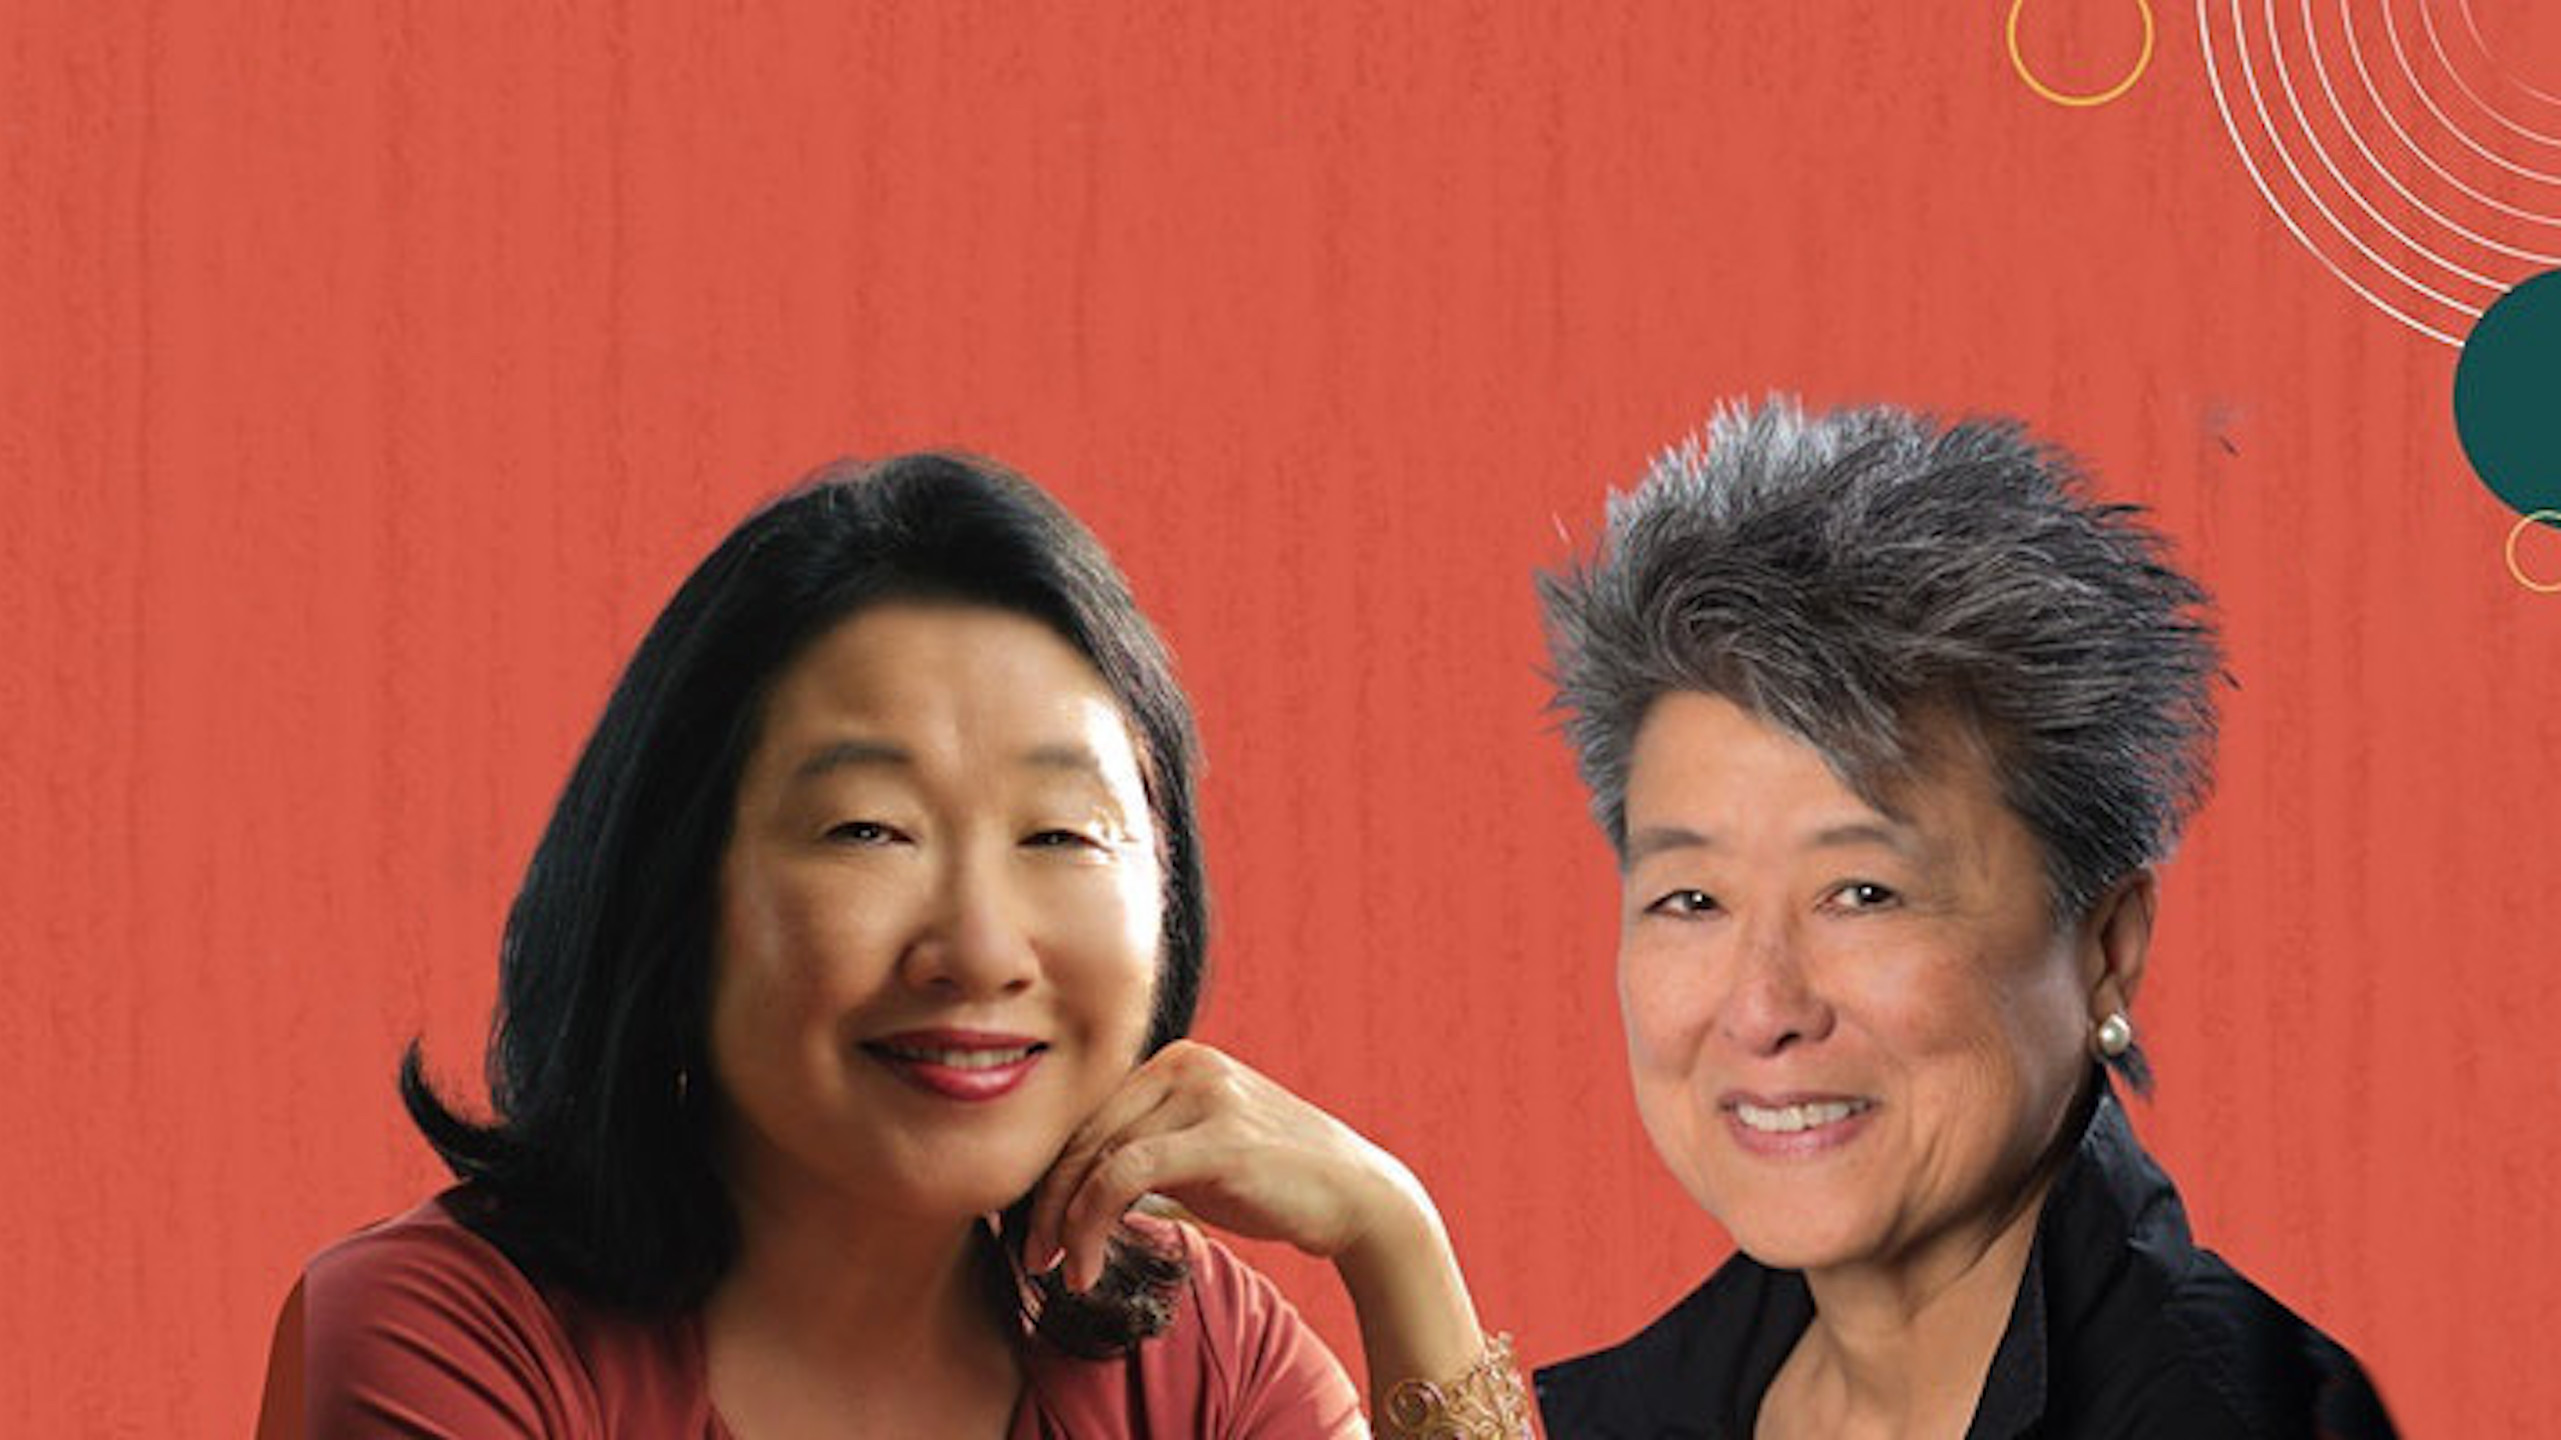 news.d.umn.edu: Asian-Americans Facing Hate